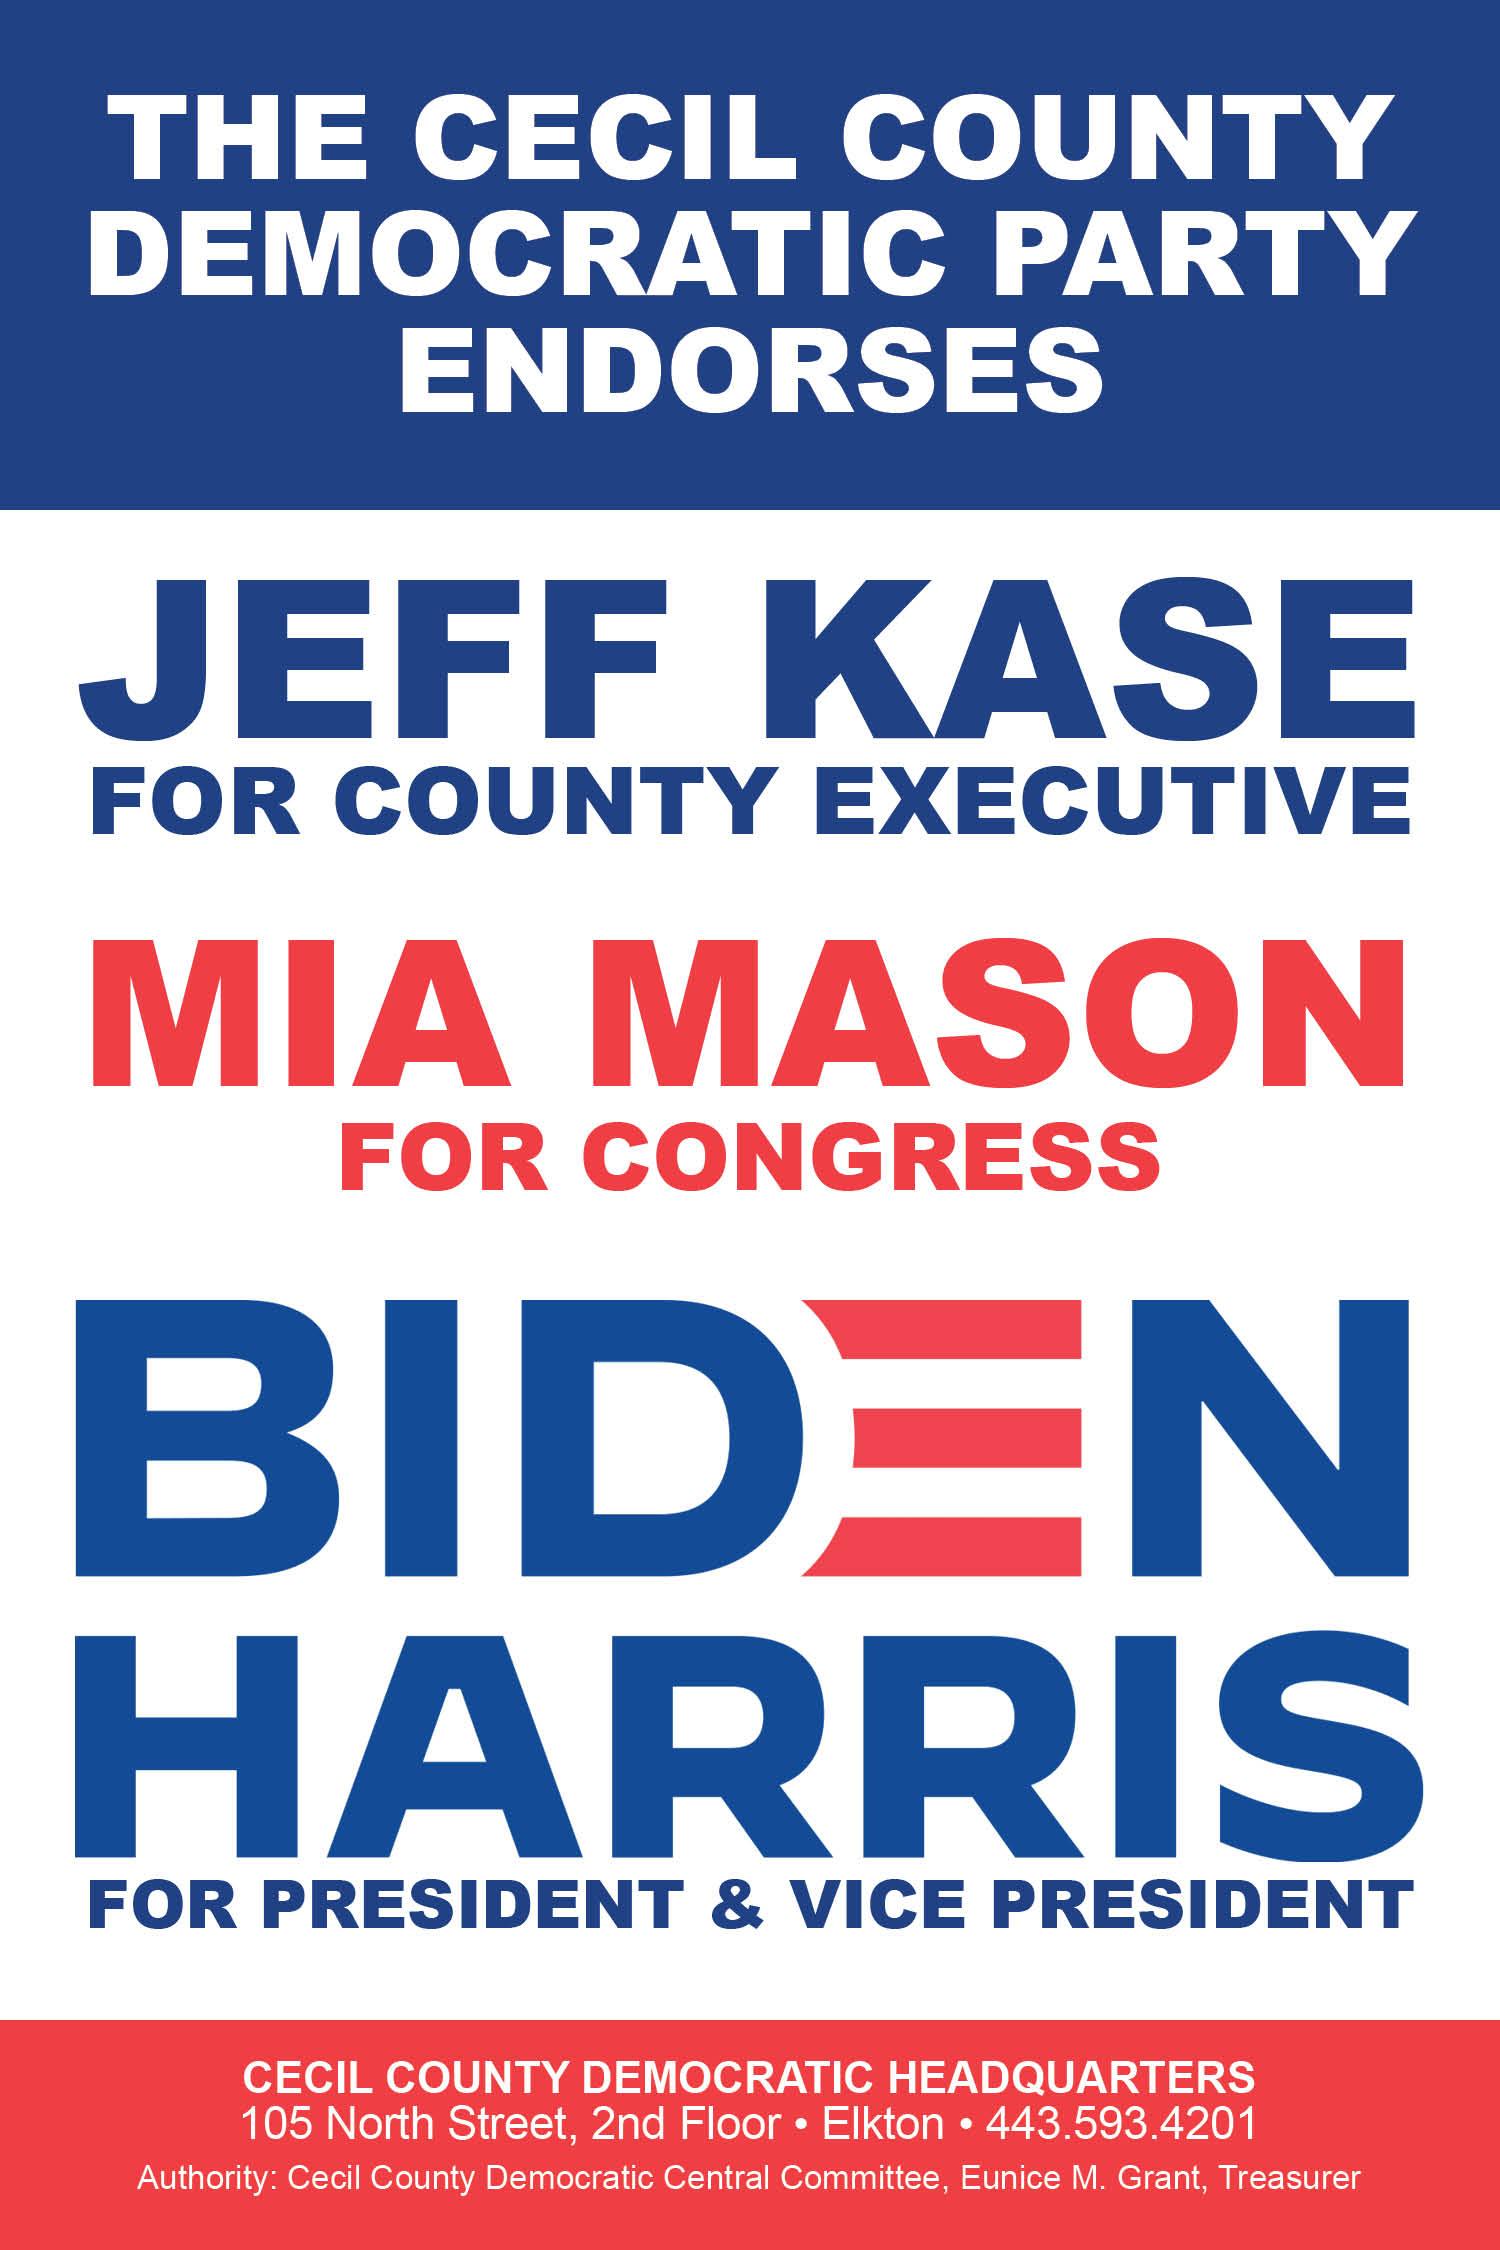 The Cecil County Democratic Party Endorses Jeff Kase, Mia Mason and Biden/Harris.